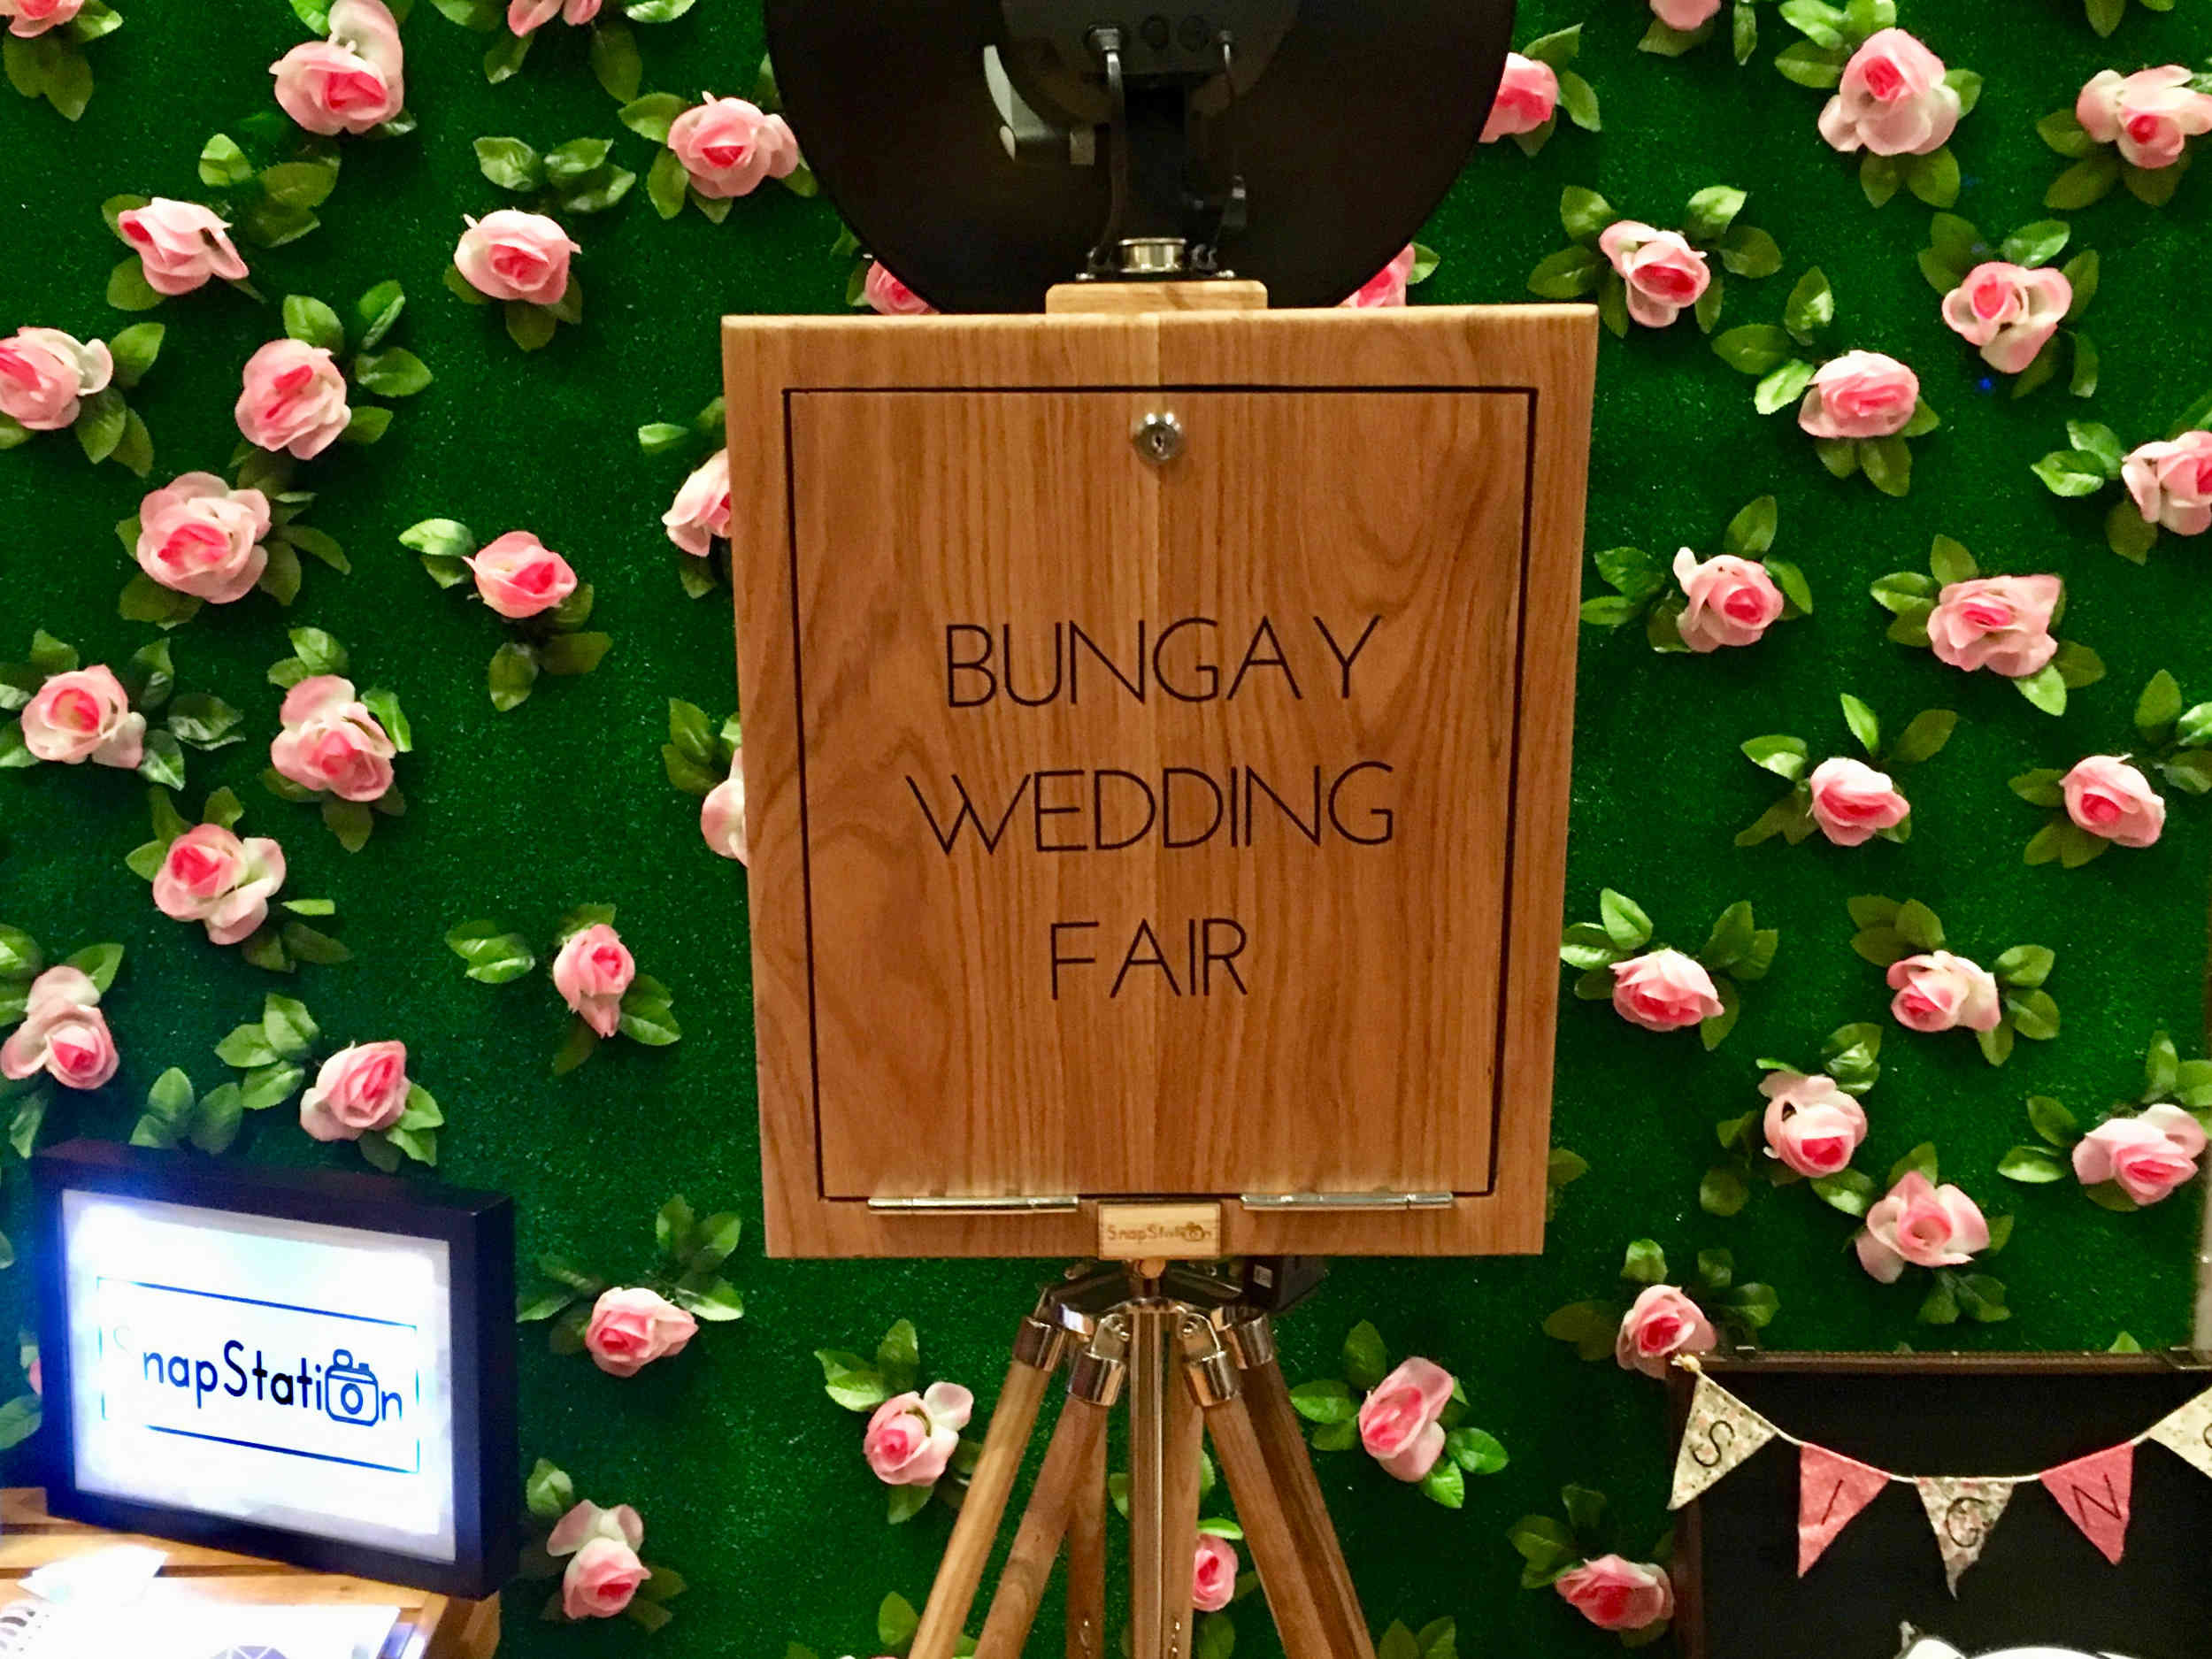 The Vintage retro photo booth - Wedding fair at Bungay, suffolk.